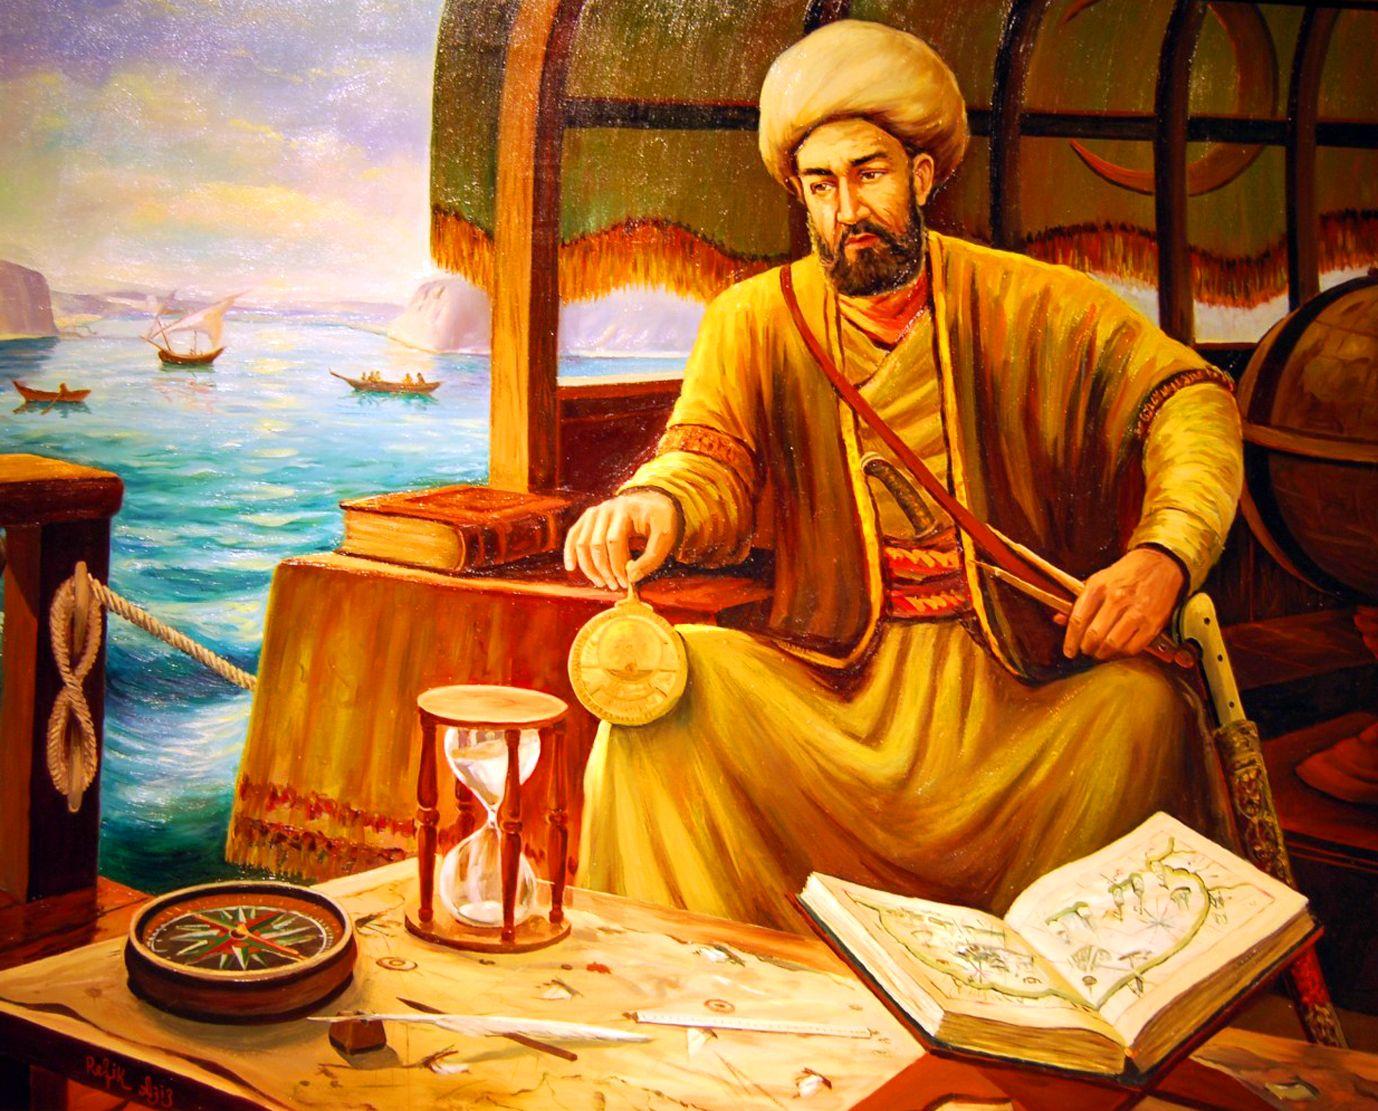 Ottoman admiral Piri Reis